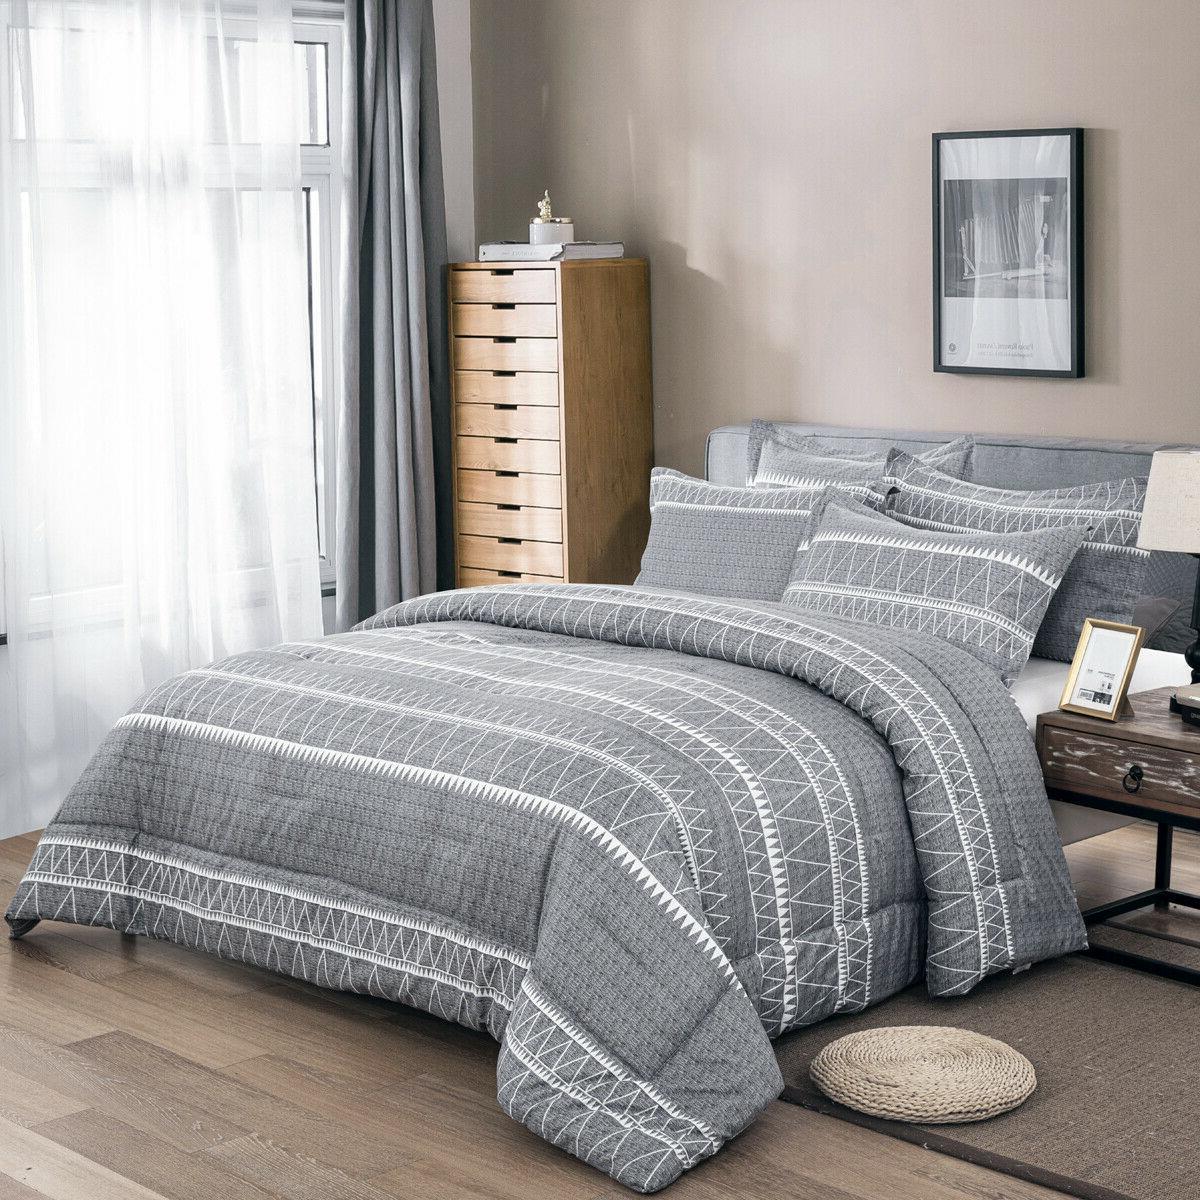 Beautiful Gray Striped Comforter Set Soft Warm Blanket Queen